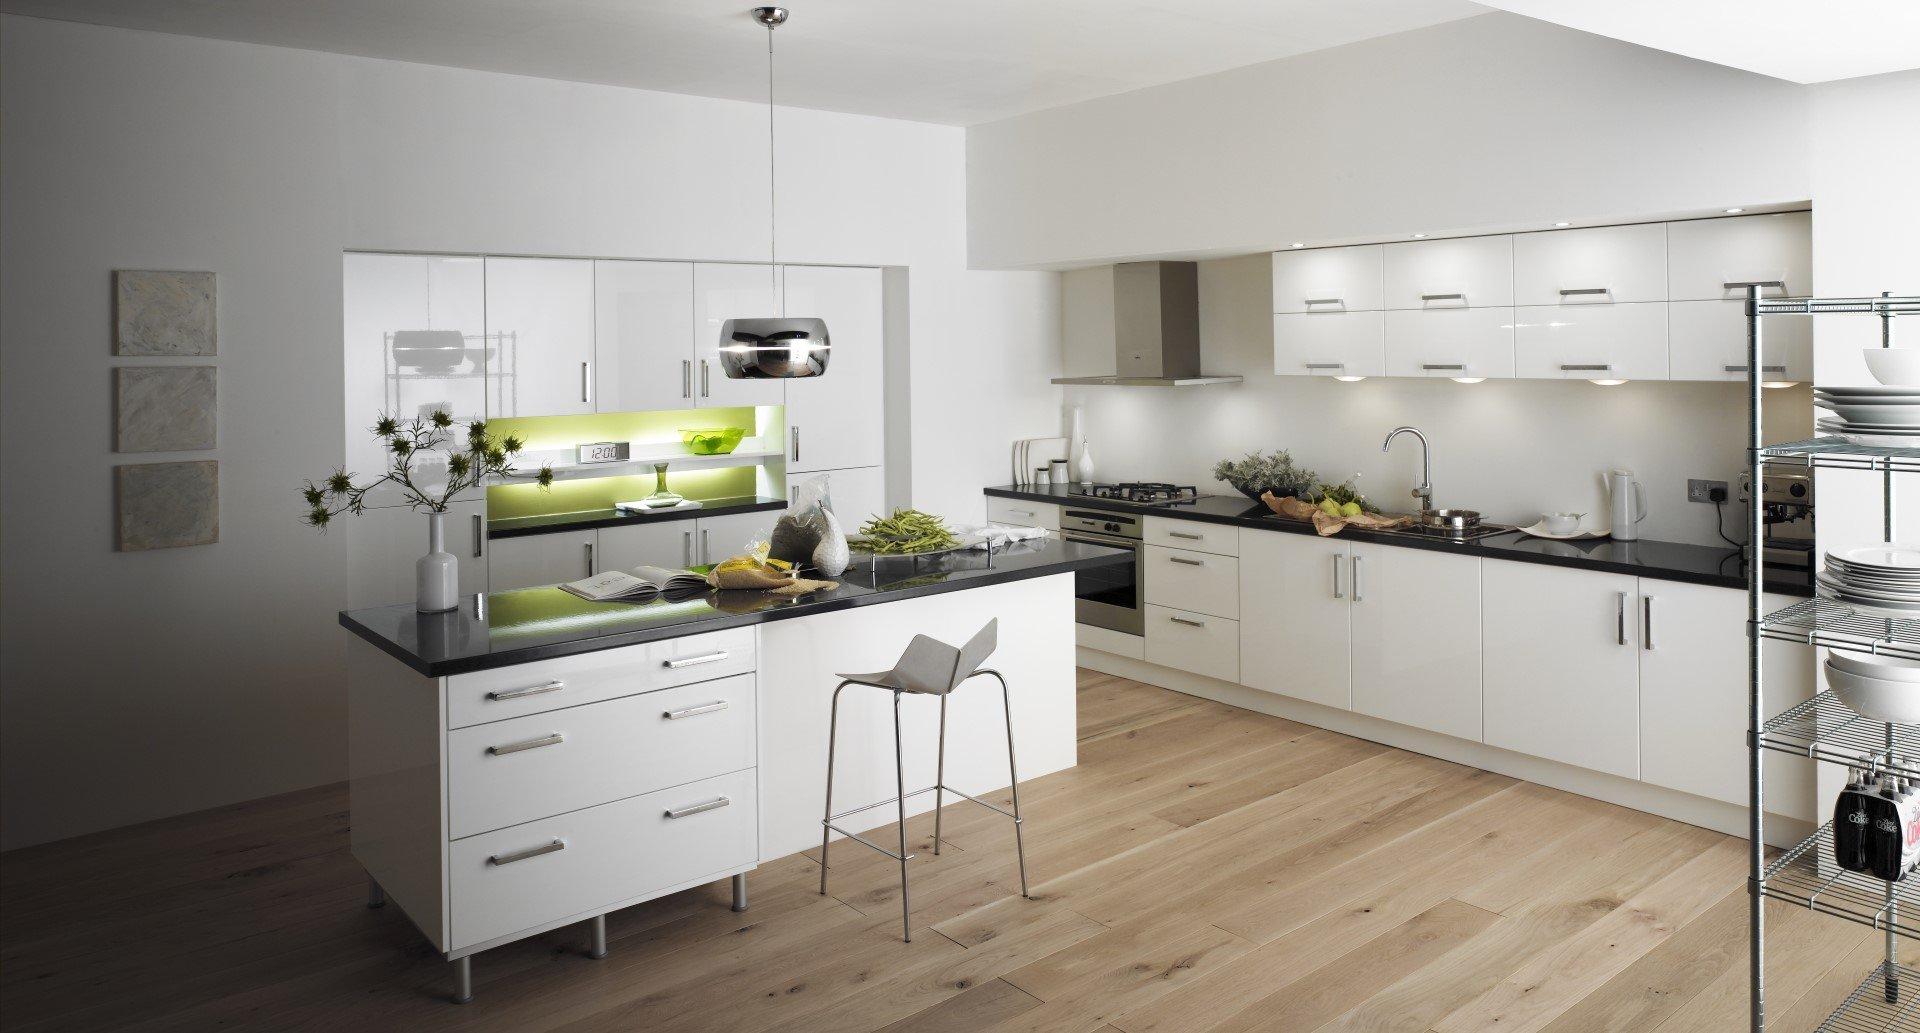 Bathroom Refurbishment | Bathroom Appliances | Fylde Coast Kitchens ...